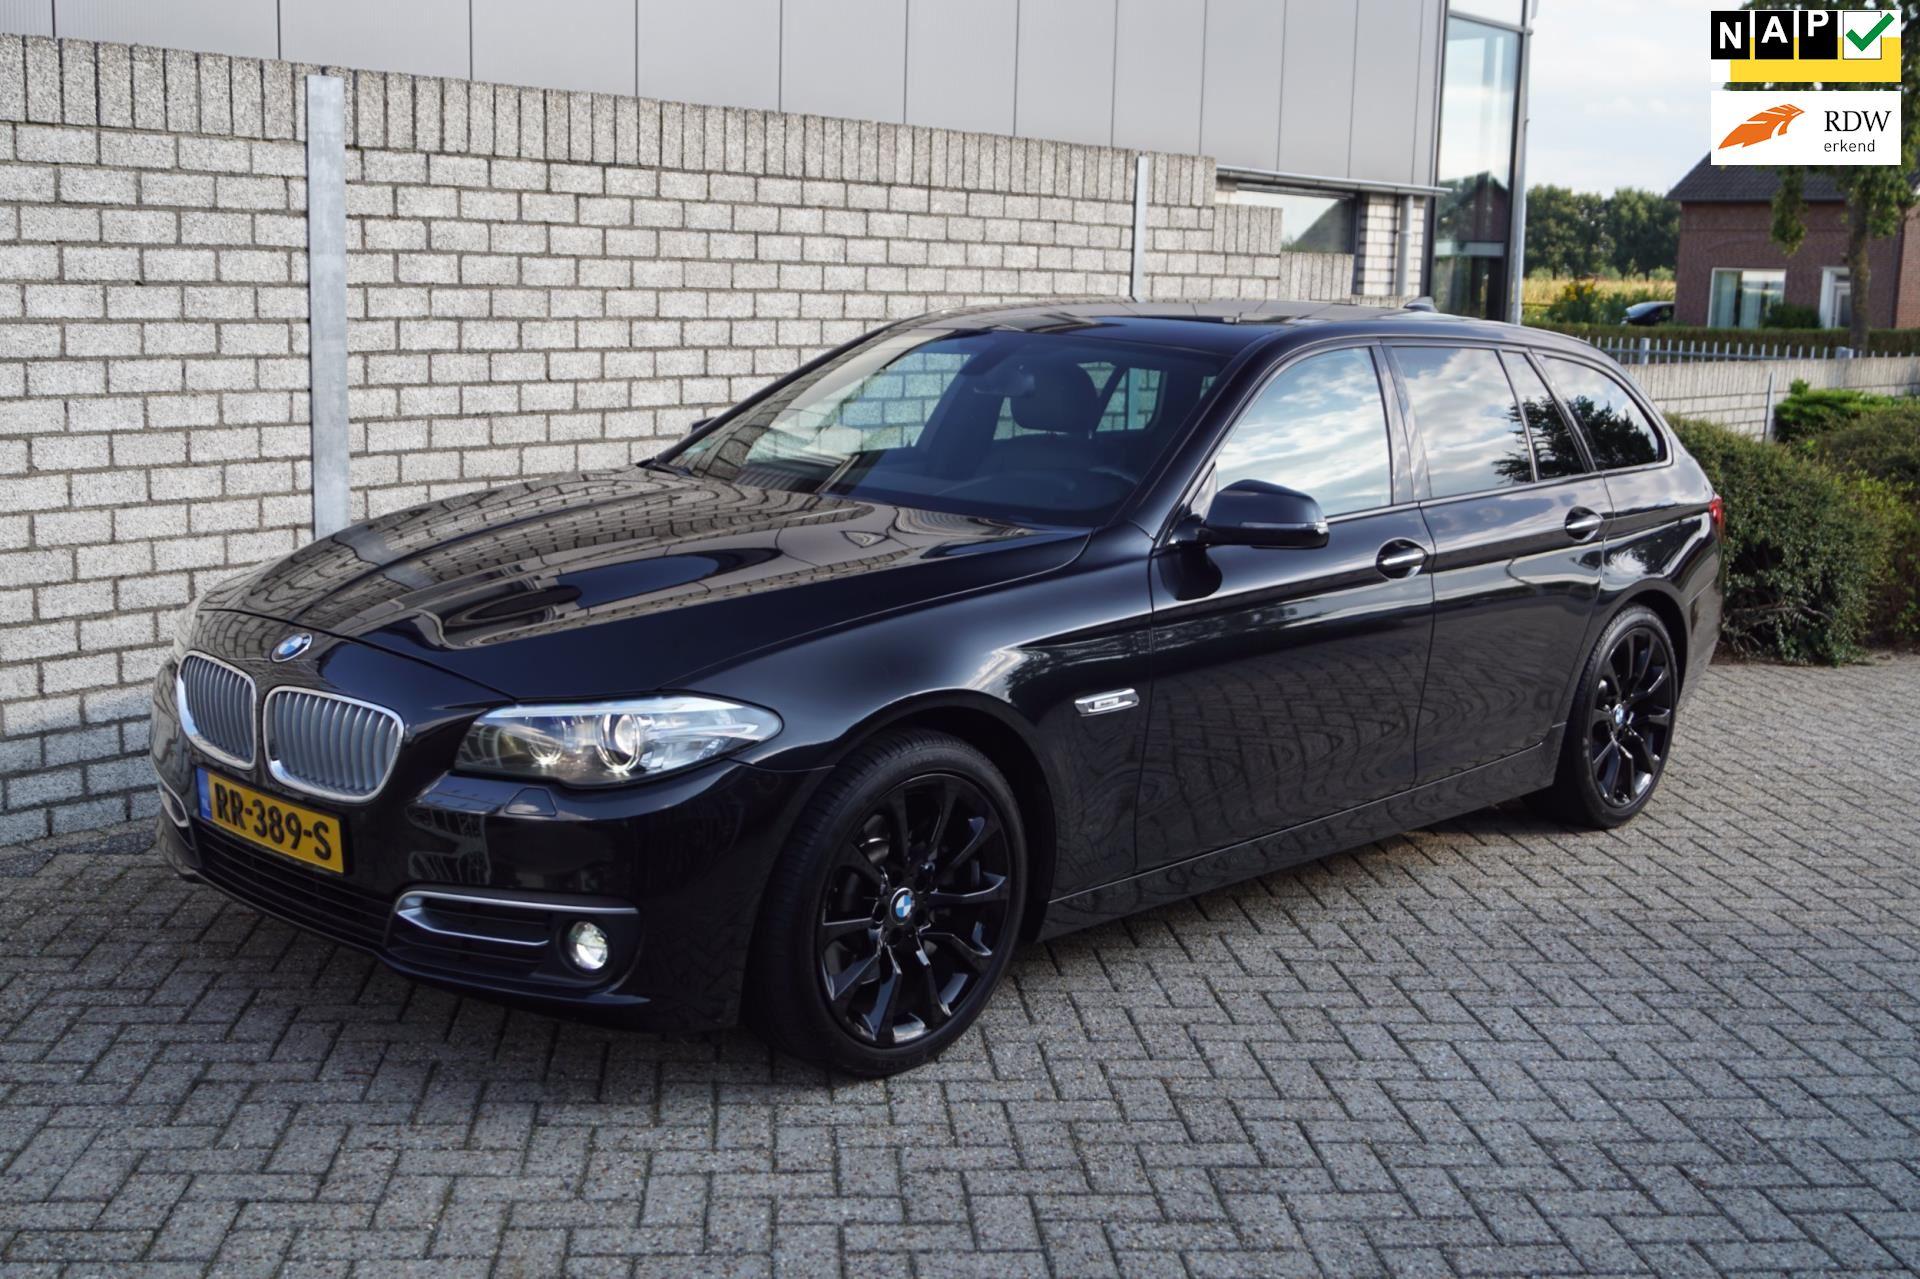 BMW 5-serie Touring occasion - Autobedrijf H. Wijdeven V.o.f.